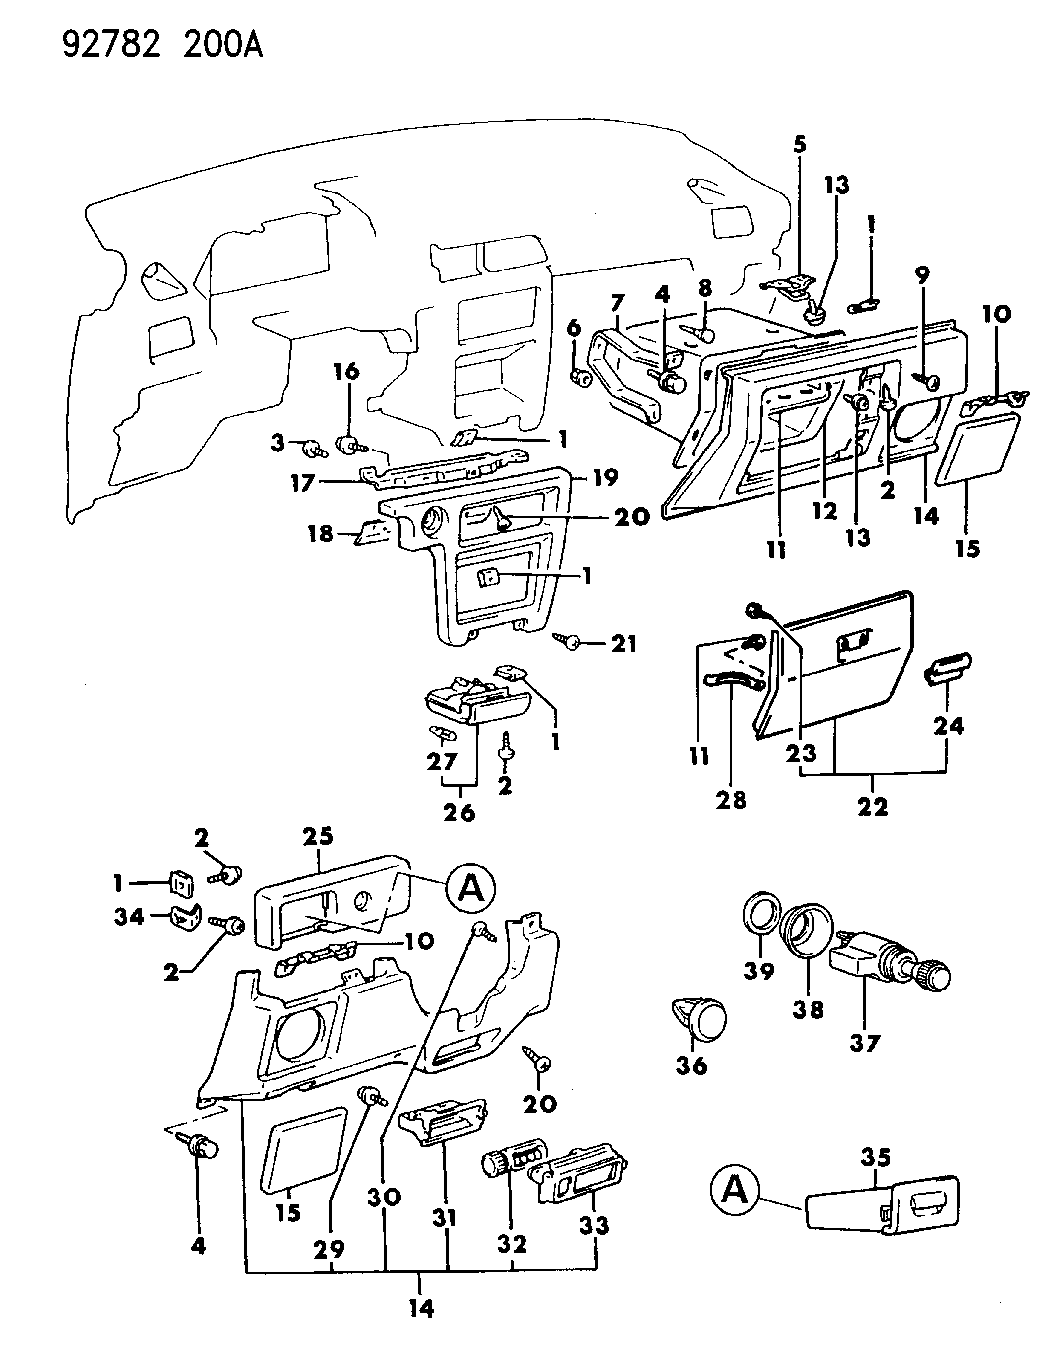 [WRG-5660] Dodge Colt Fuse Box